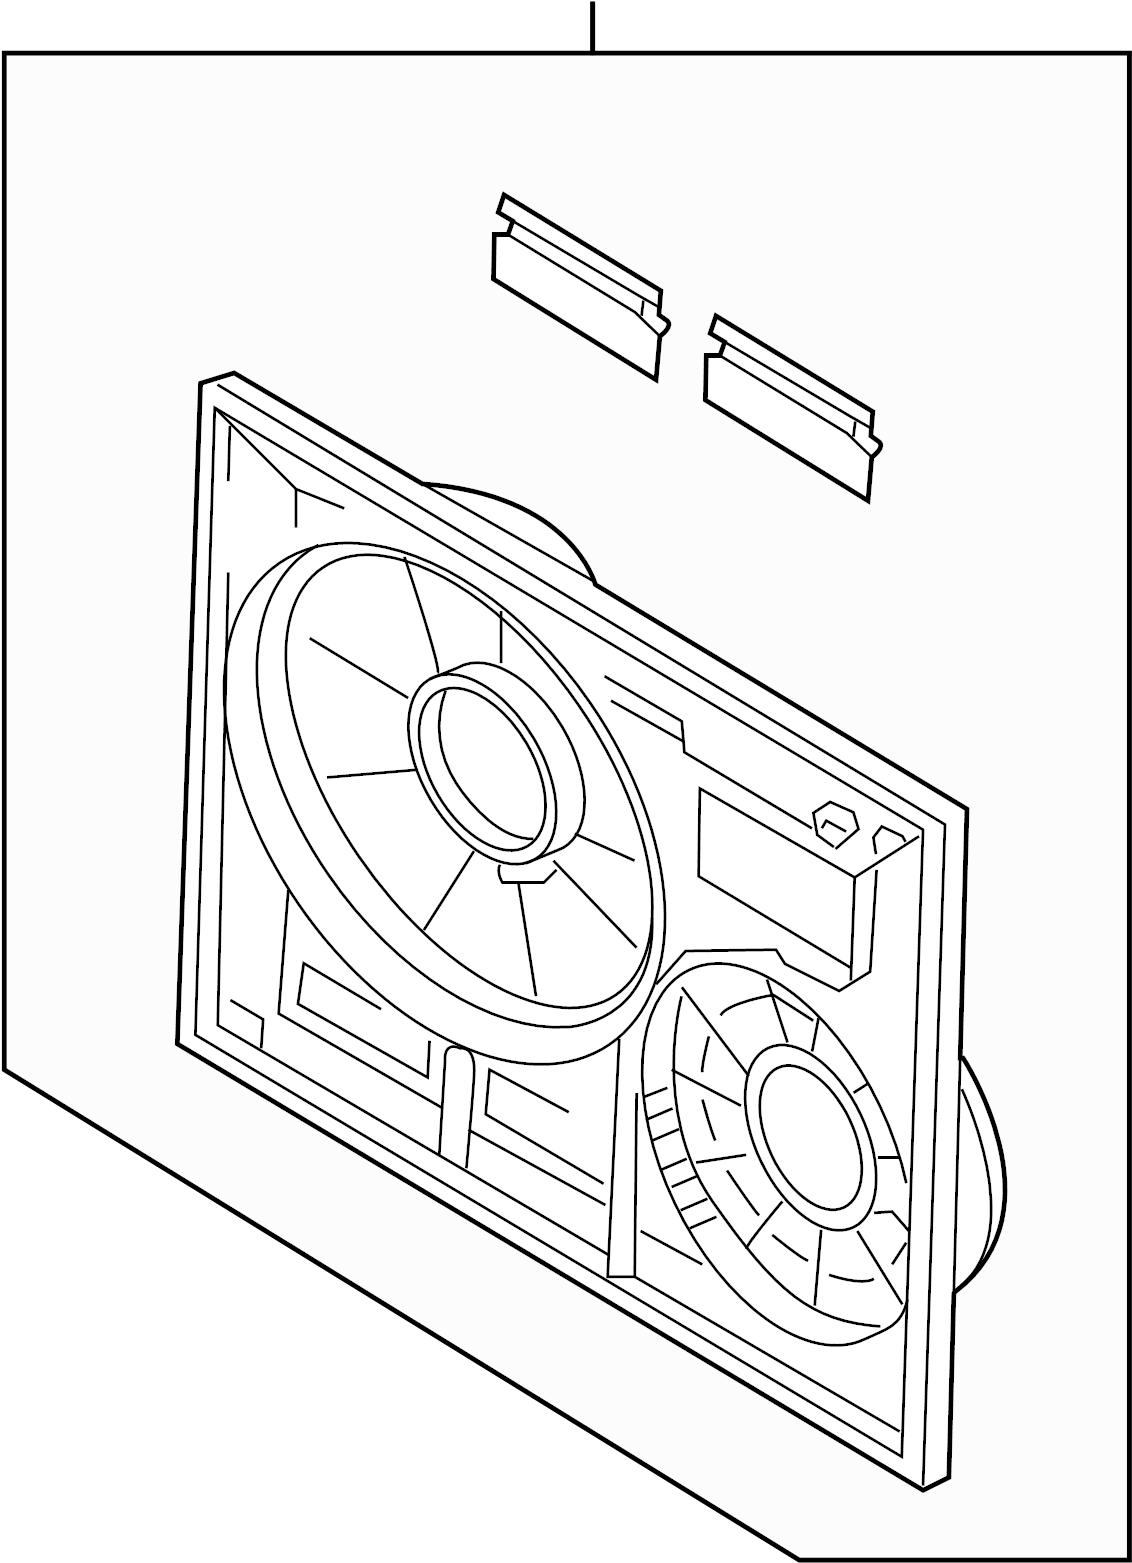 Volkswagen Touareg Engine Cooling Fan Shroud